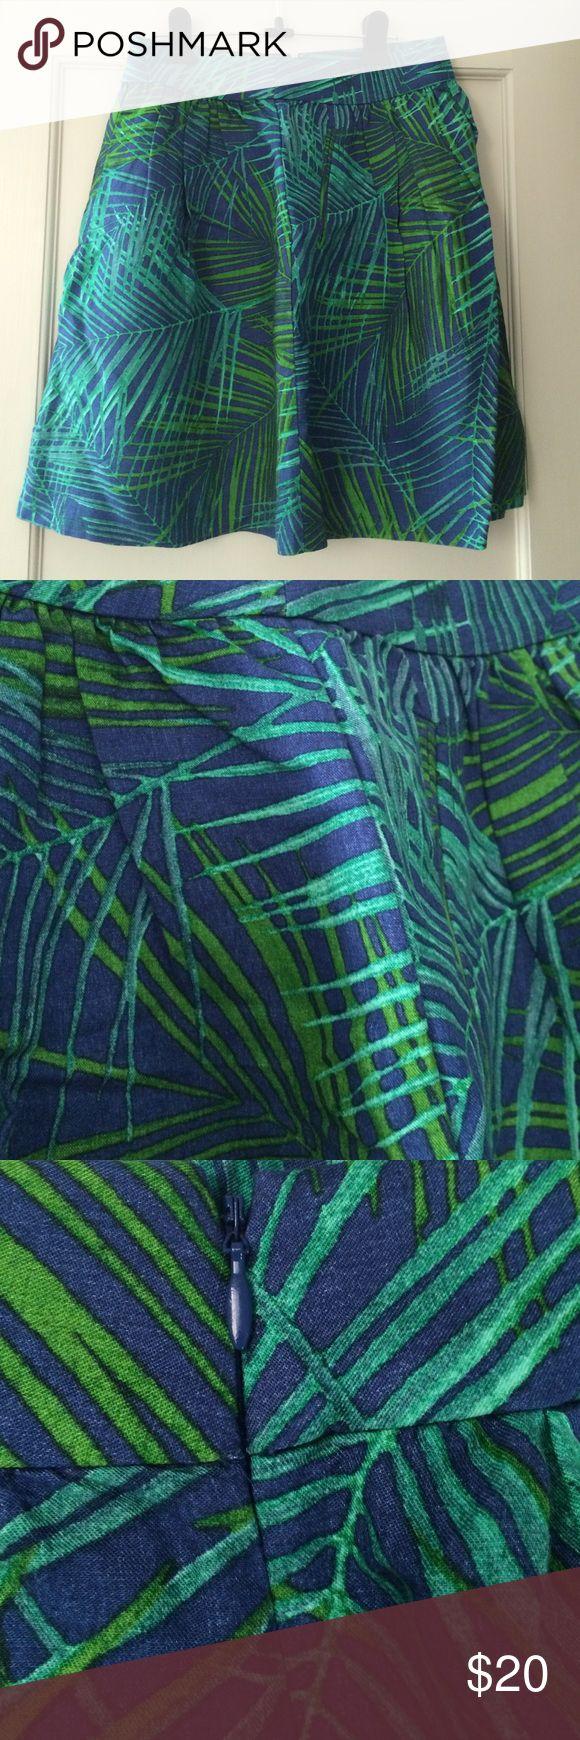 Banana Republic Patterned A-Line Skirt Blue and green patterned A-Line Skirt from Banana Republic Banana Republic Skirts